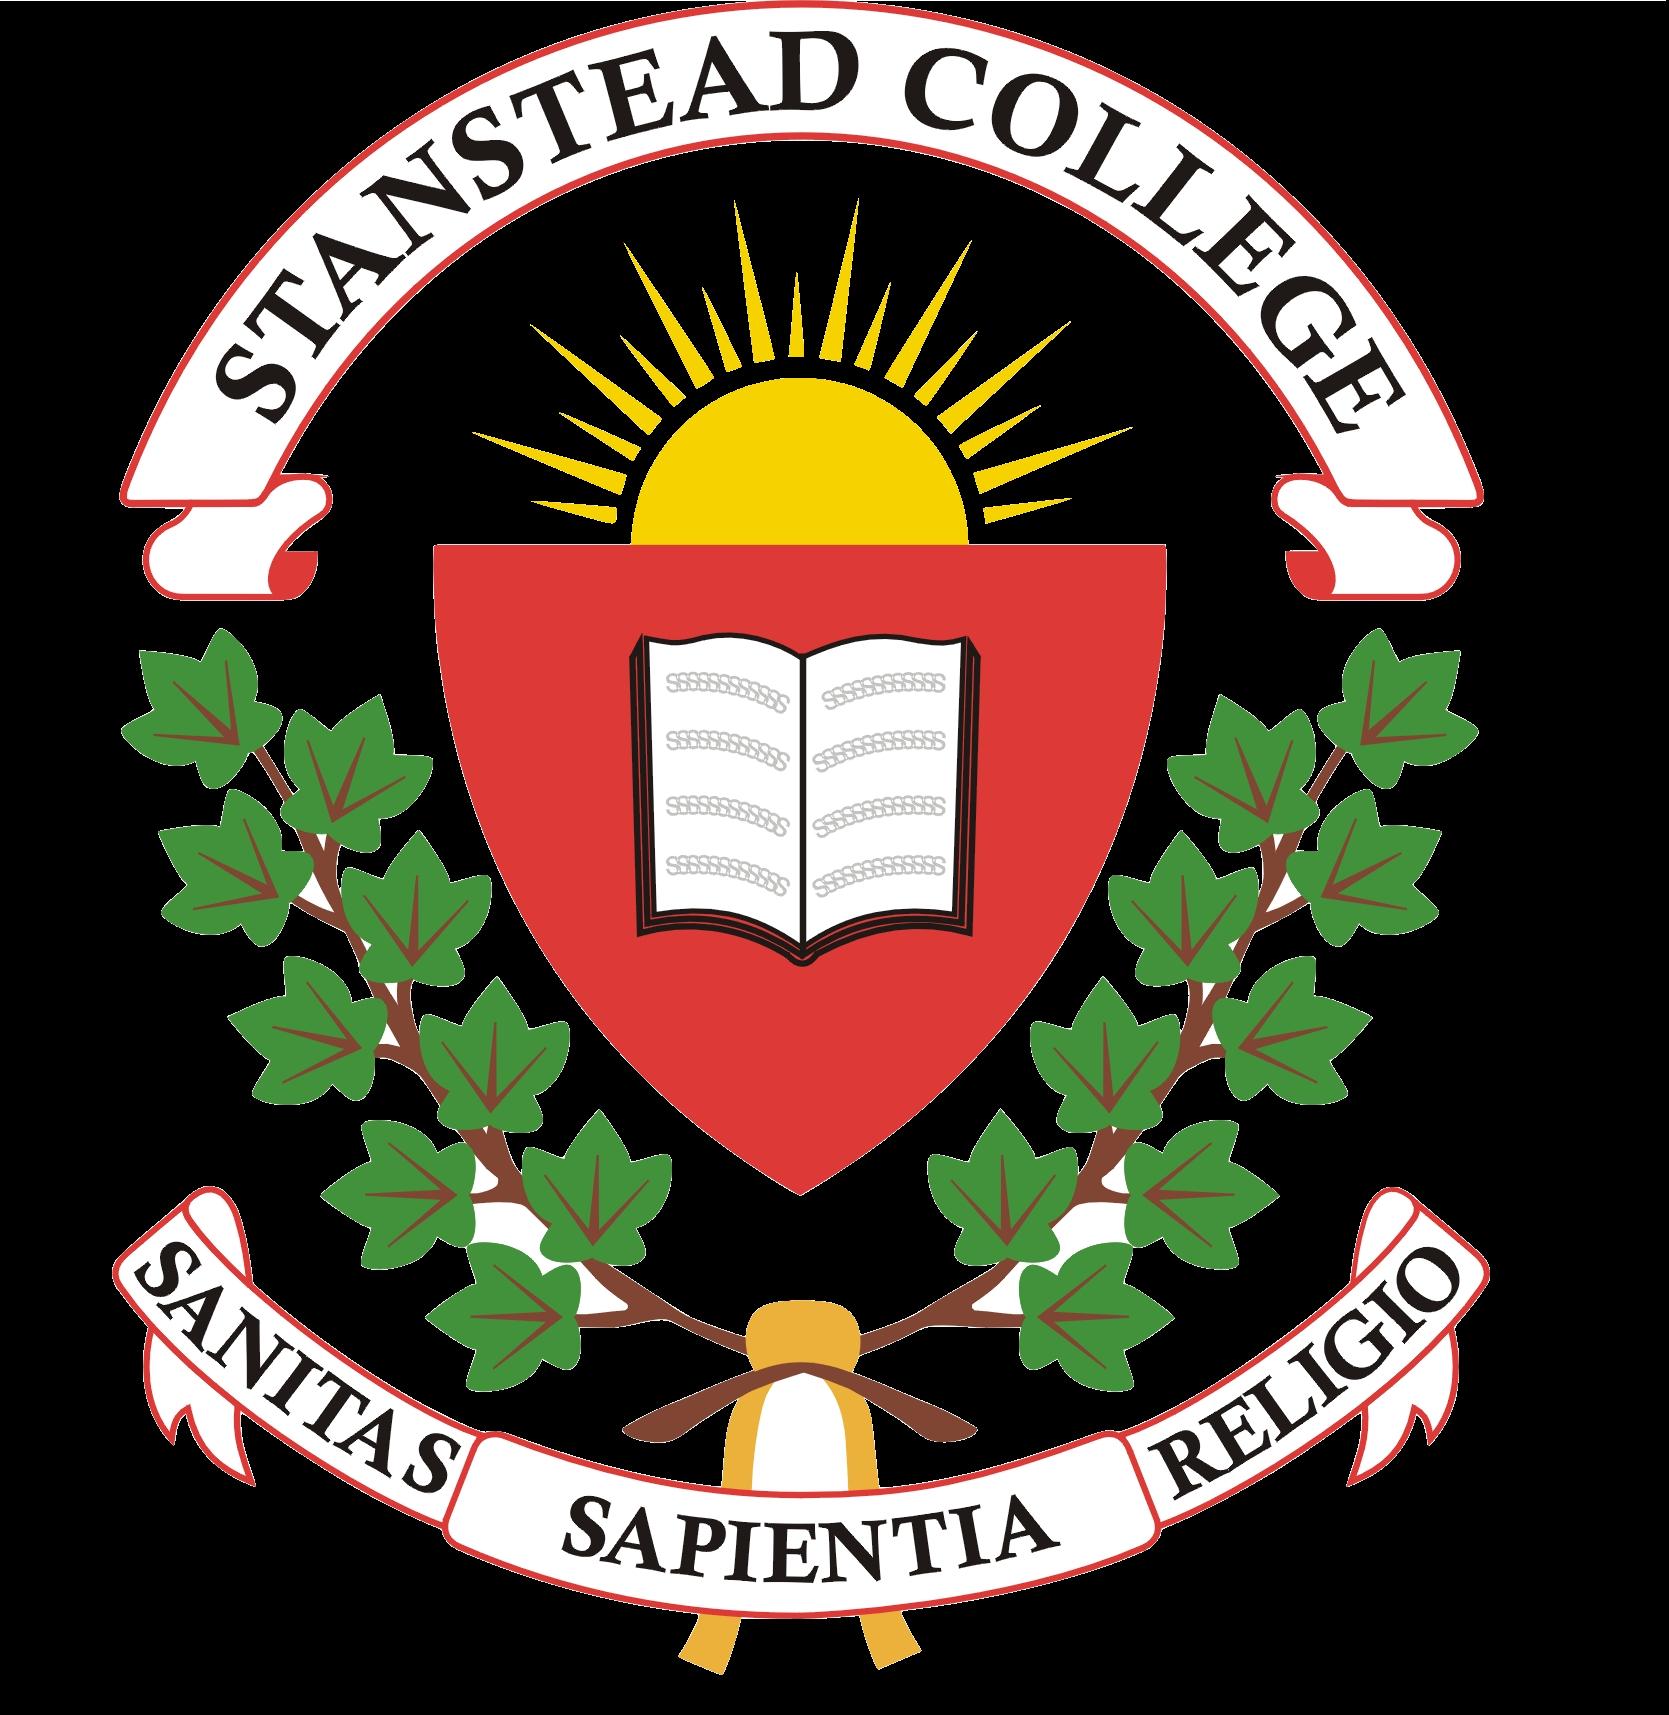 Stanstead College School